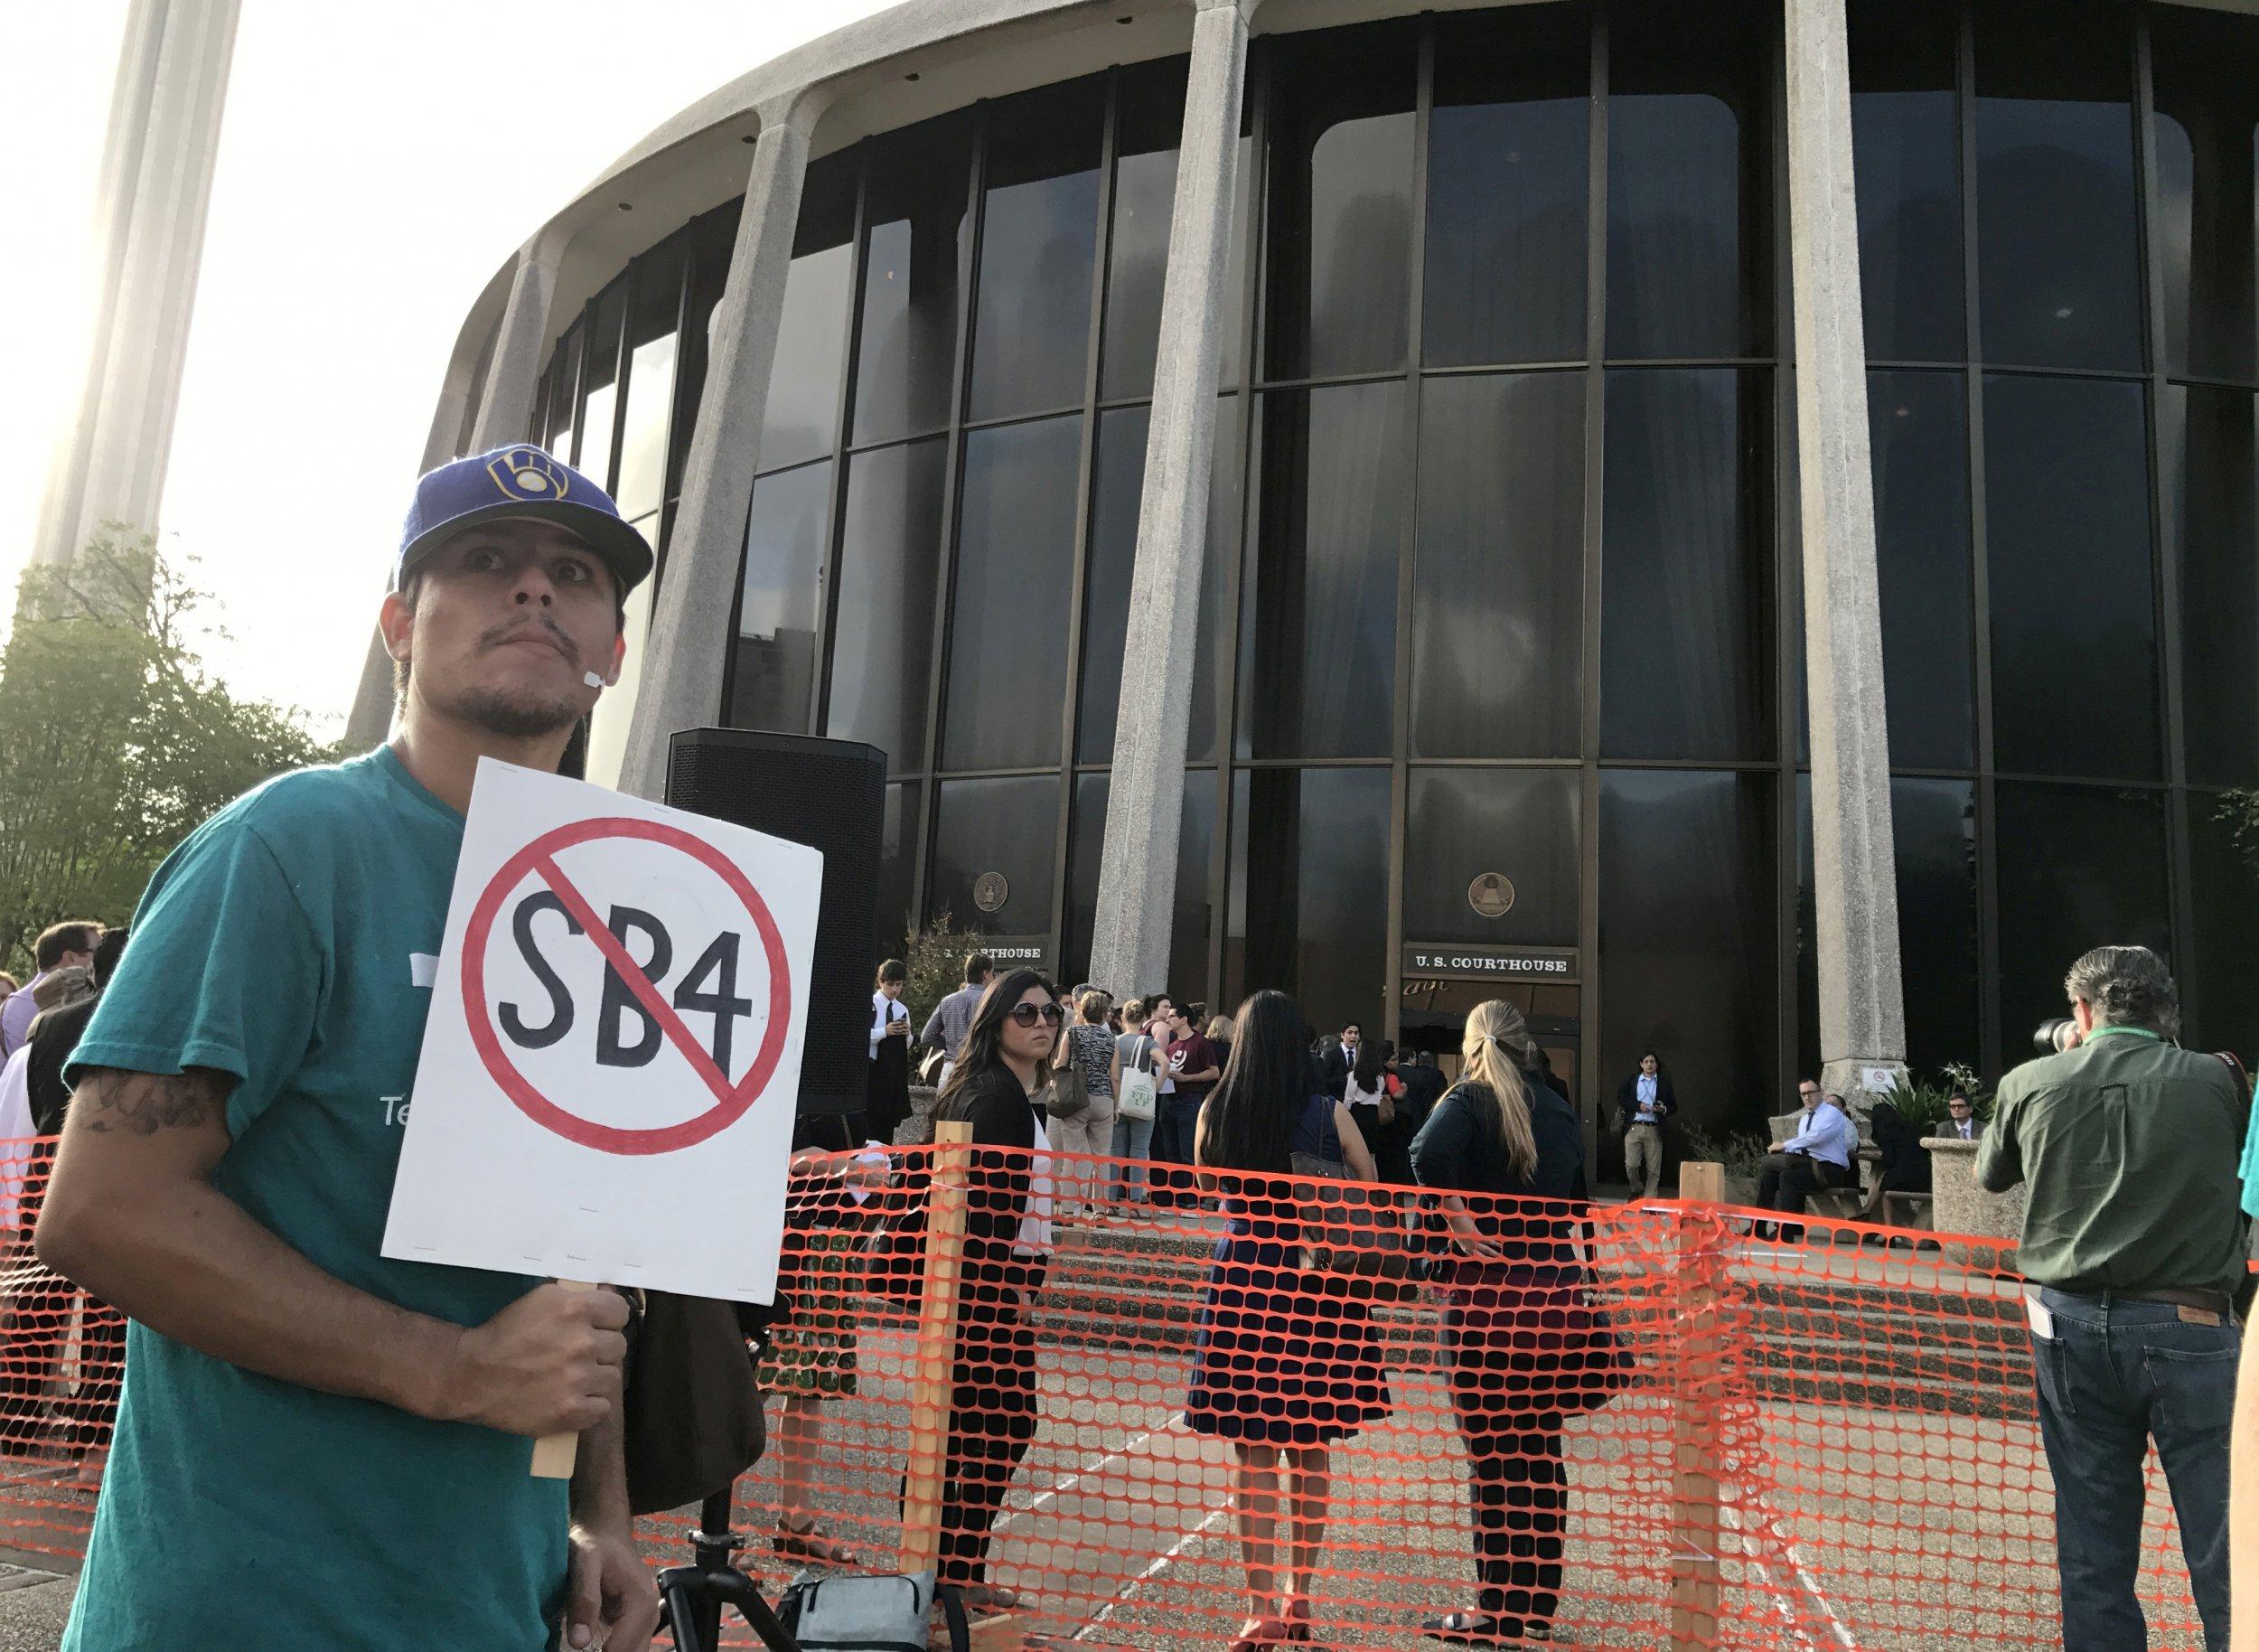 Texas protest against sanctuary cities crackdown